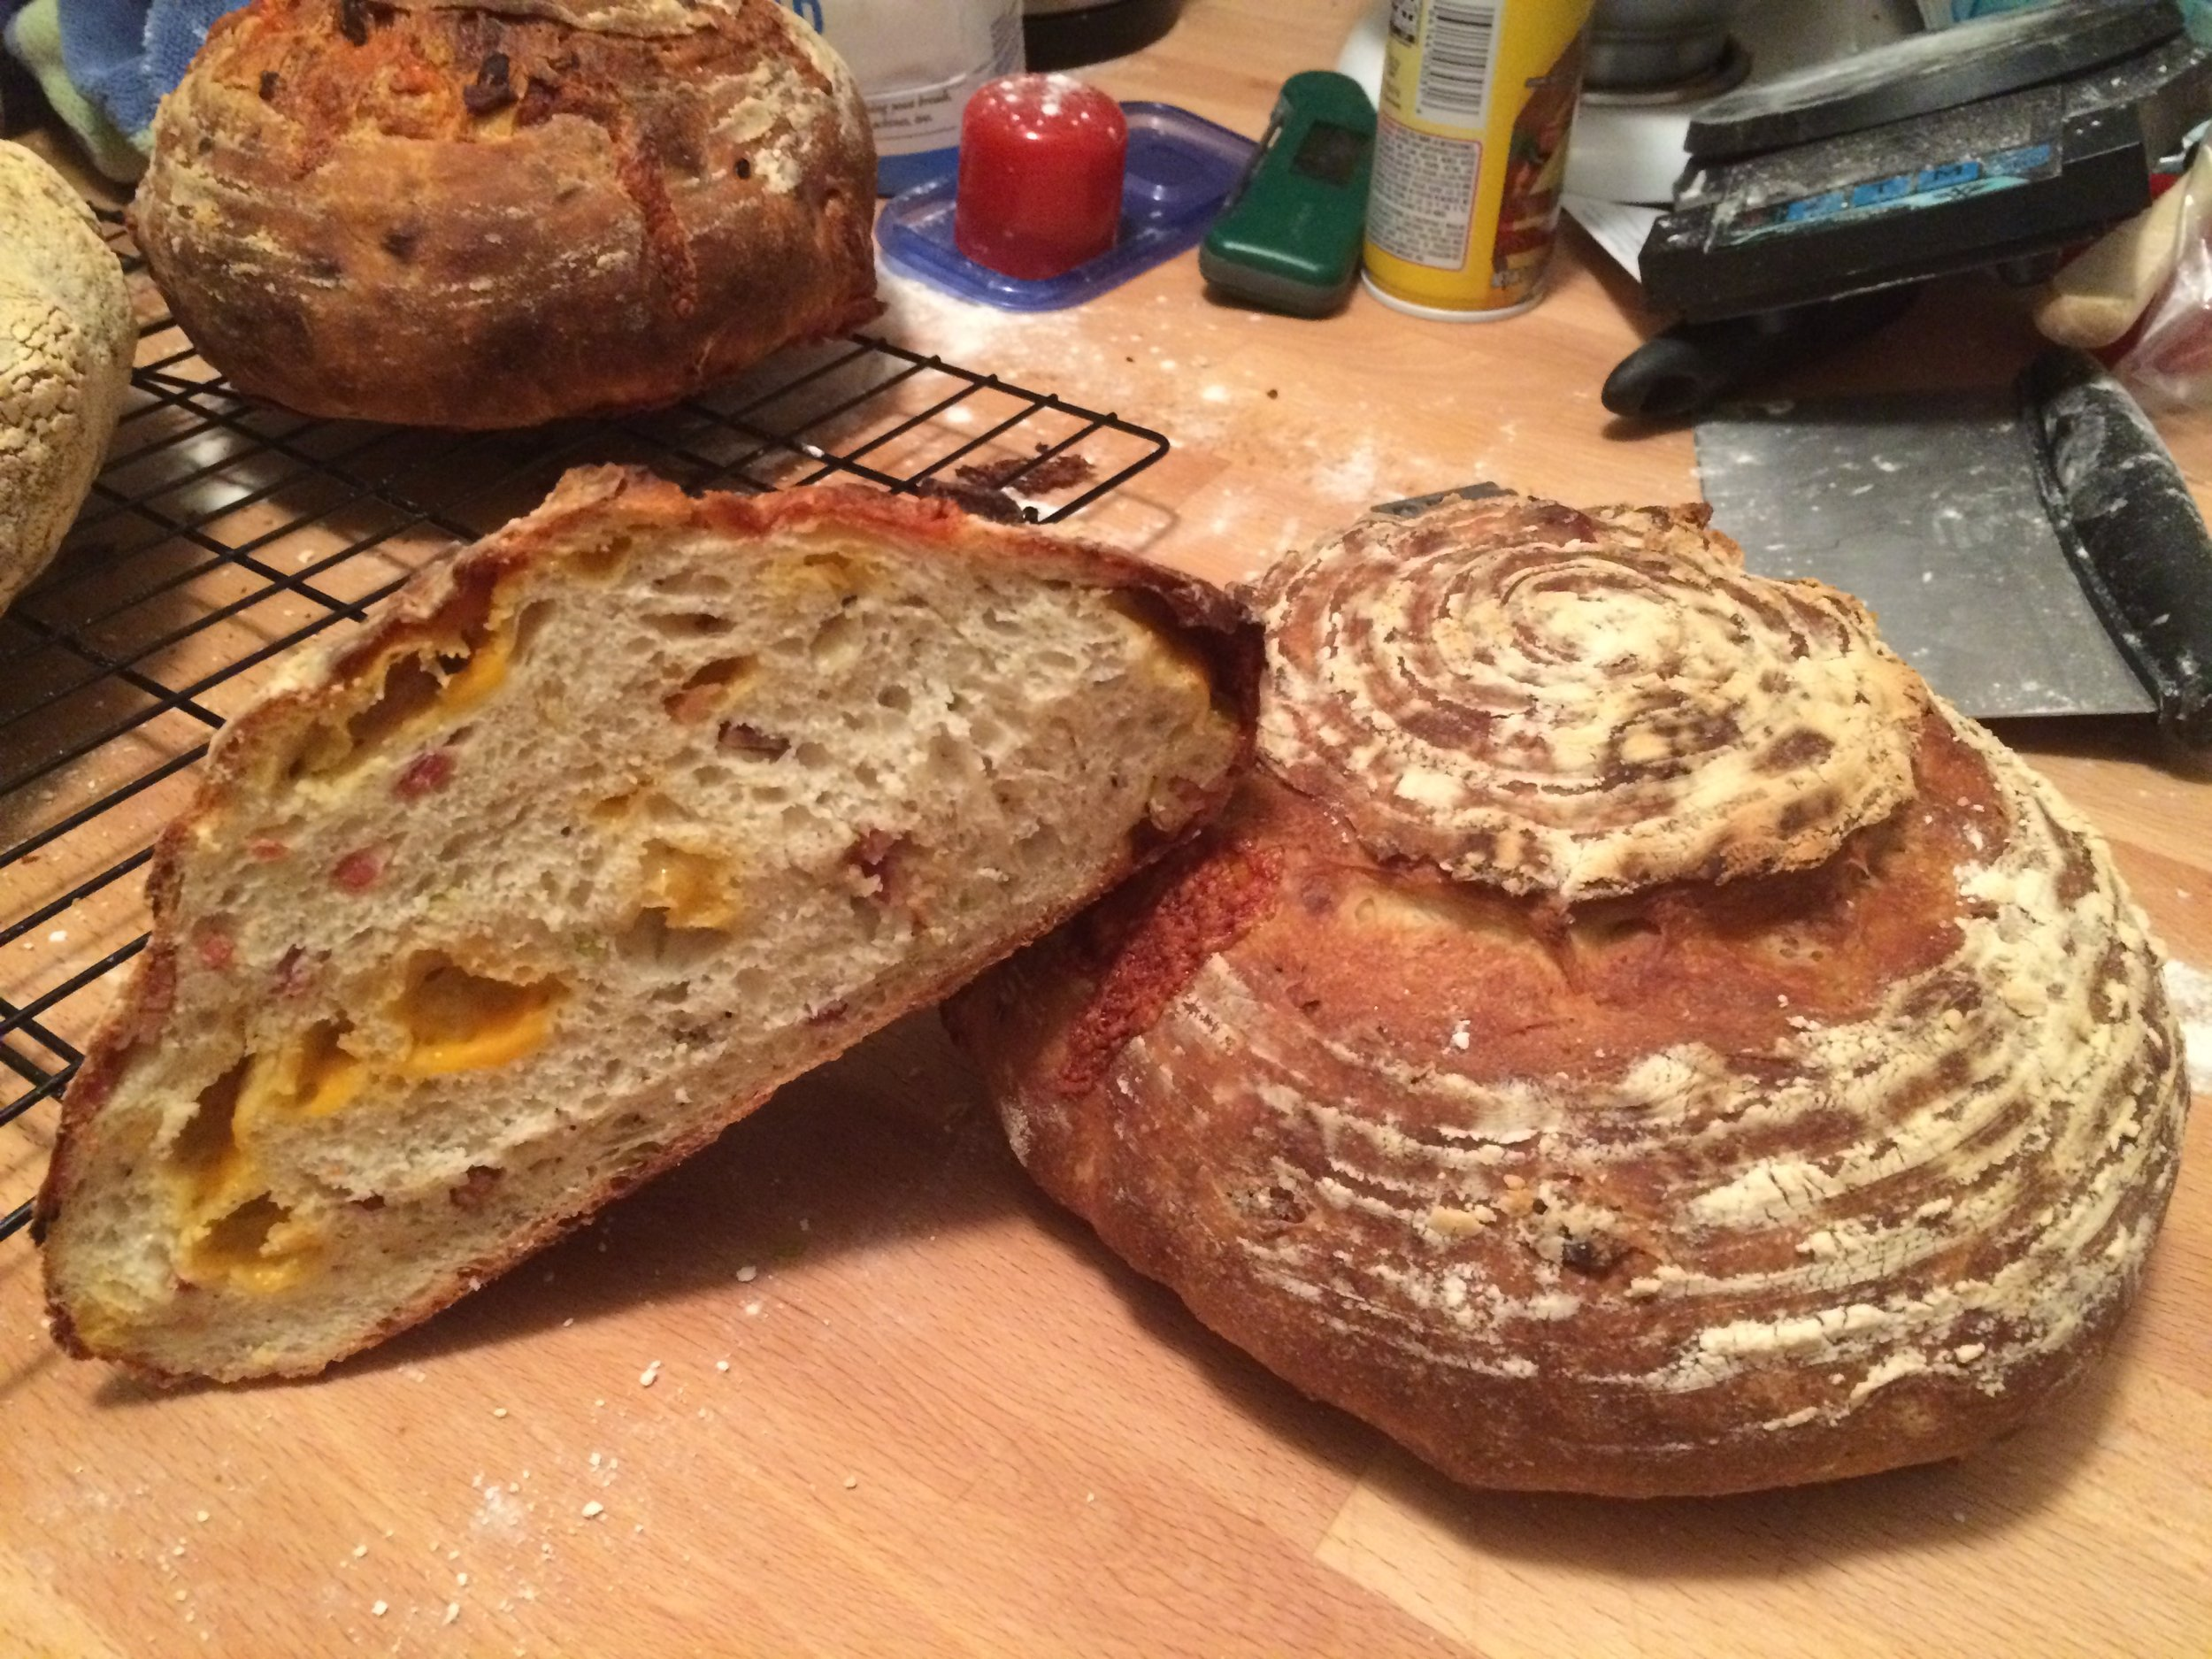 Cheddar and bacon sourdough bread